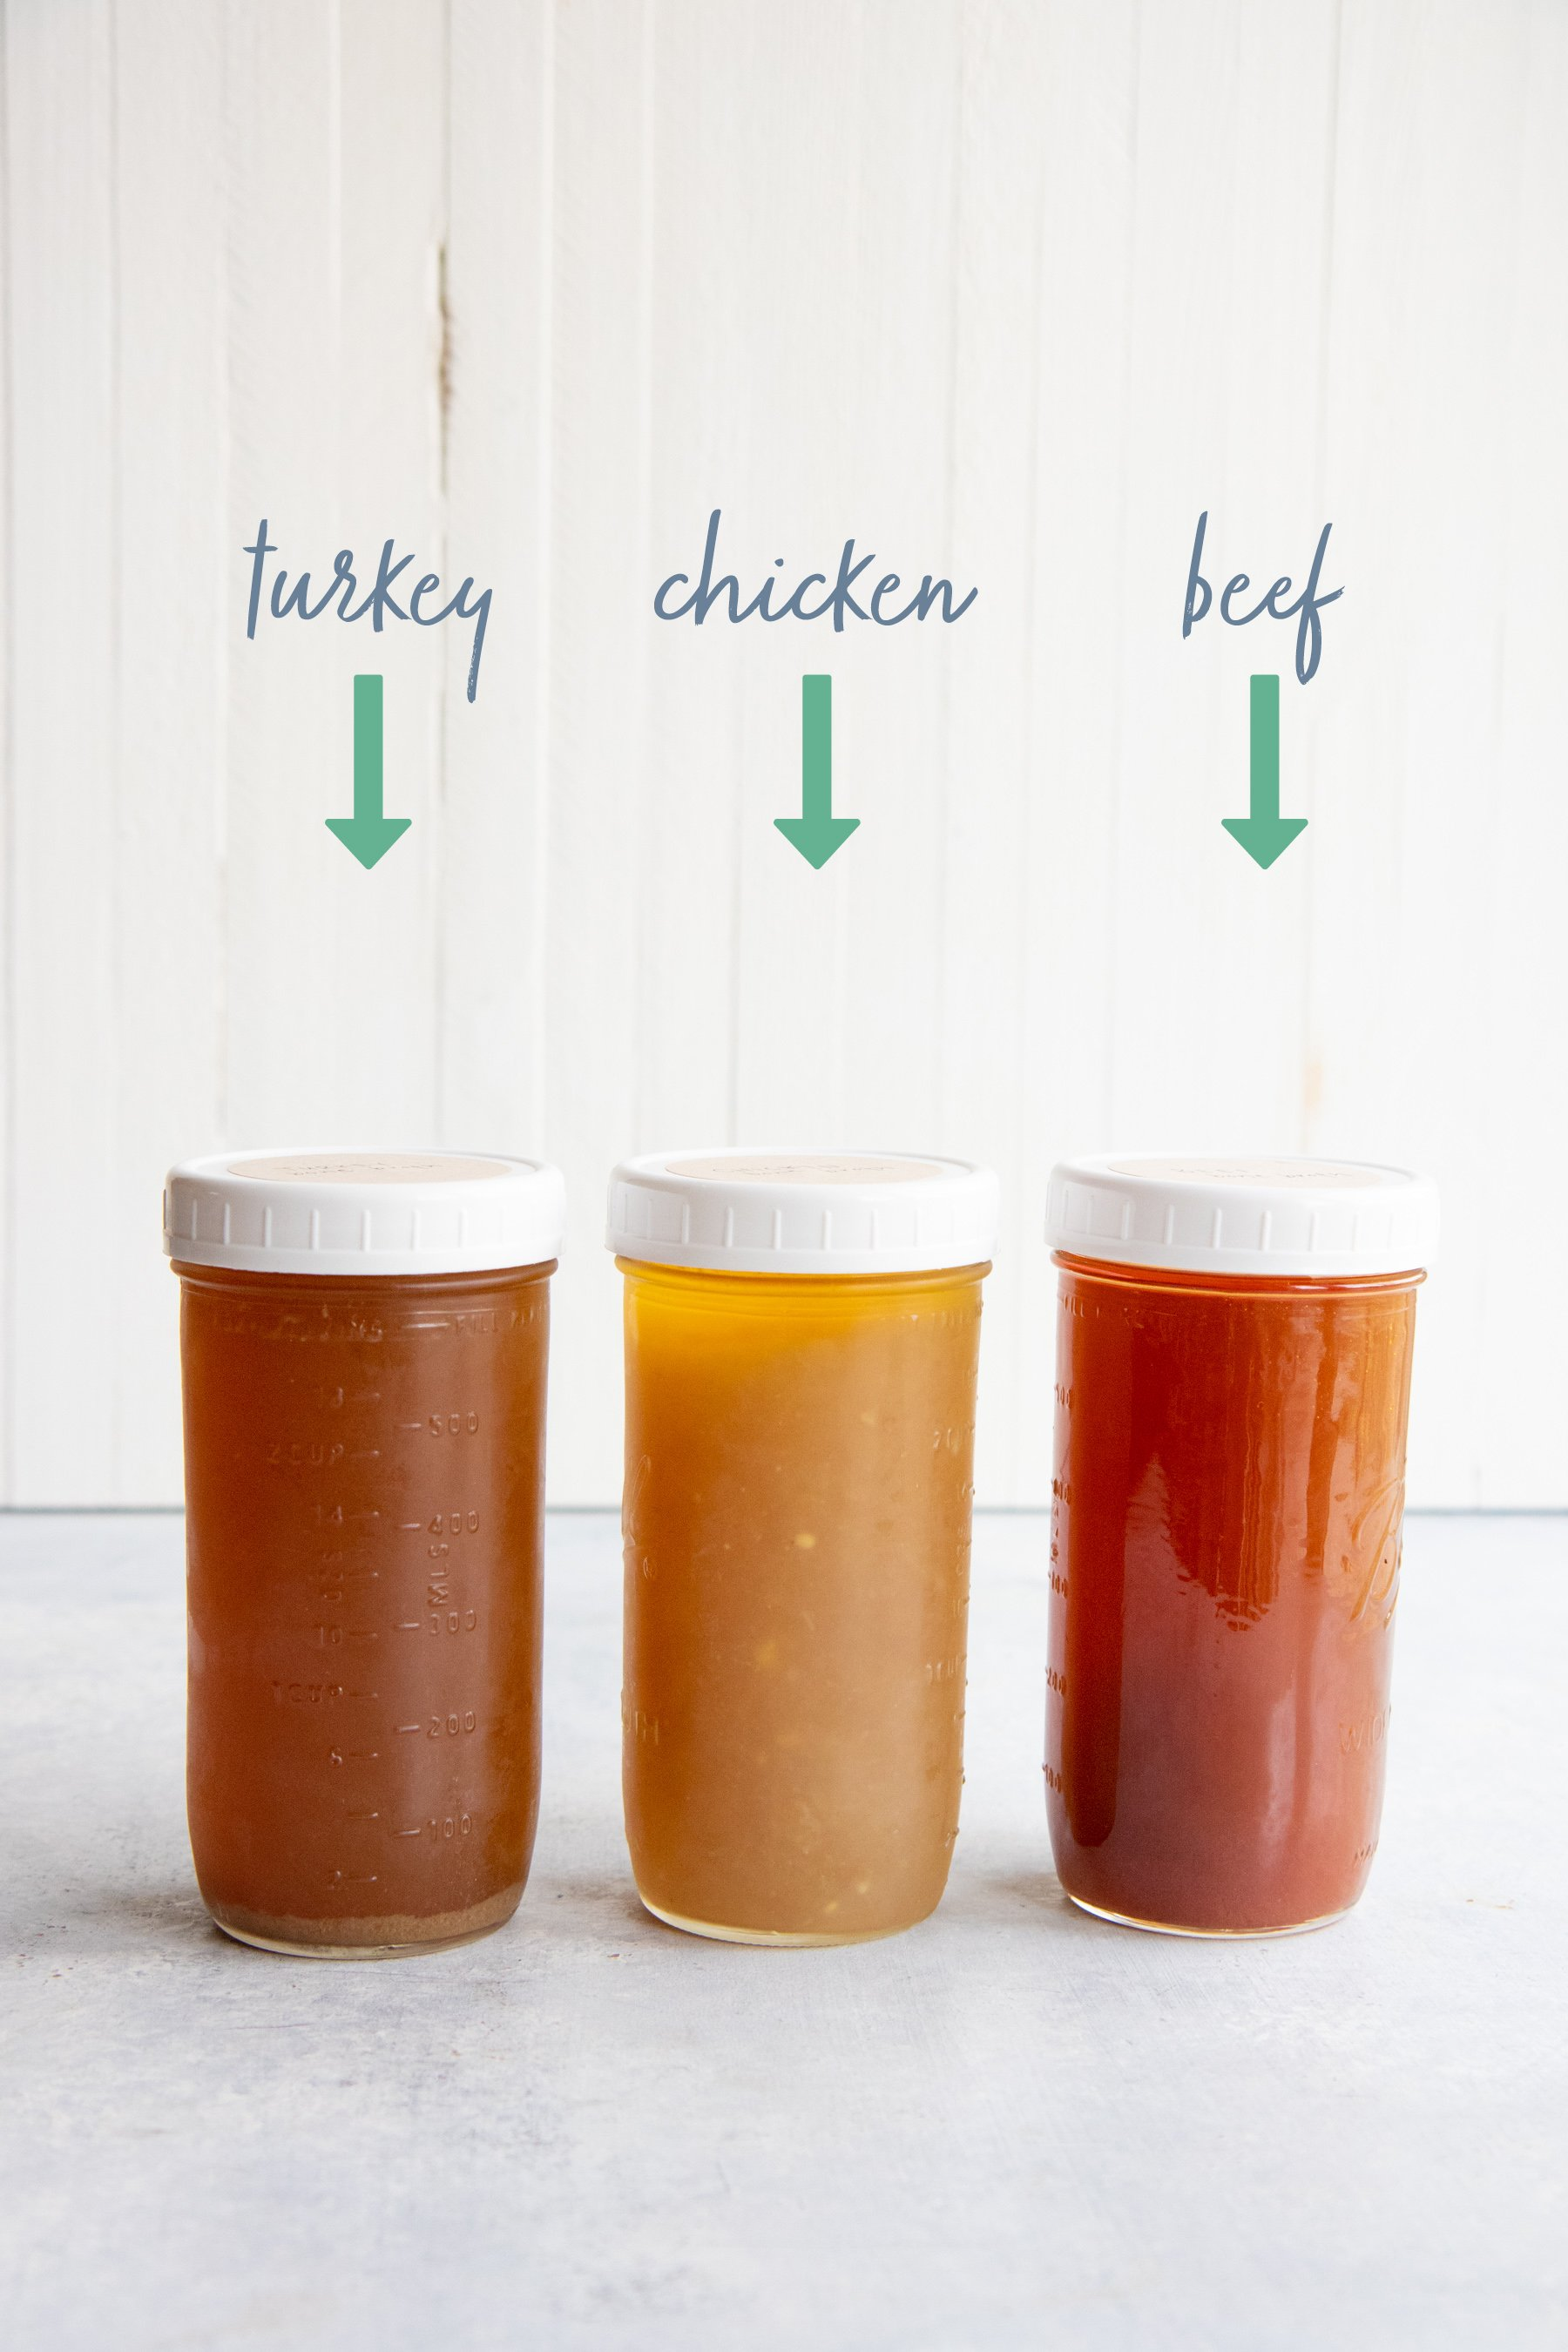 Side shot of three jars of bone broth - made from turkey, chicken, and beef bones